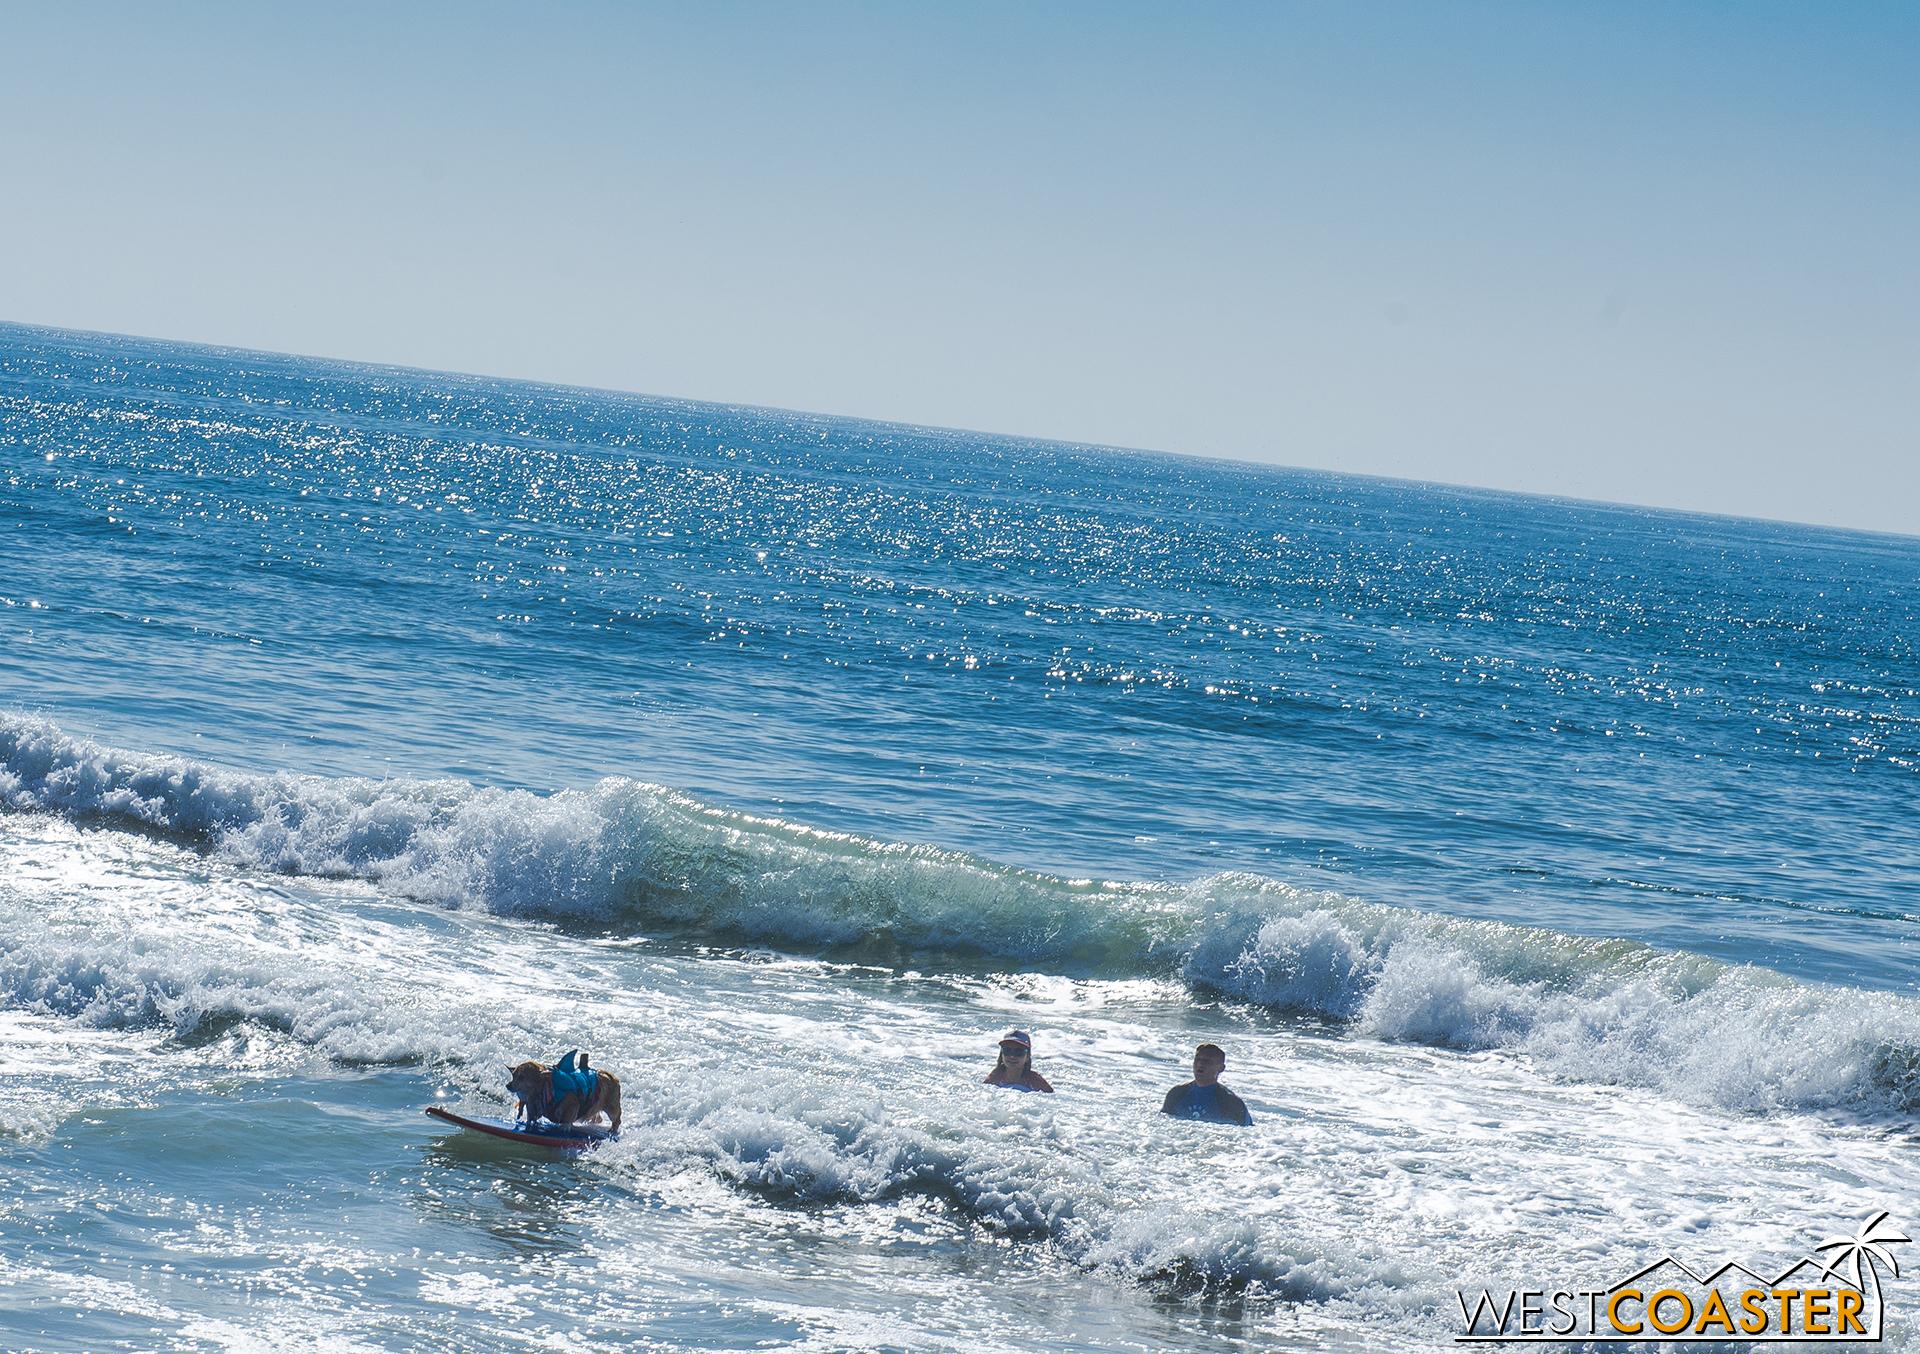 Super Corgi Jojo surfed the waves in Huntington Beach.